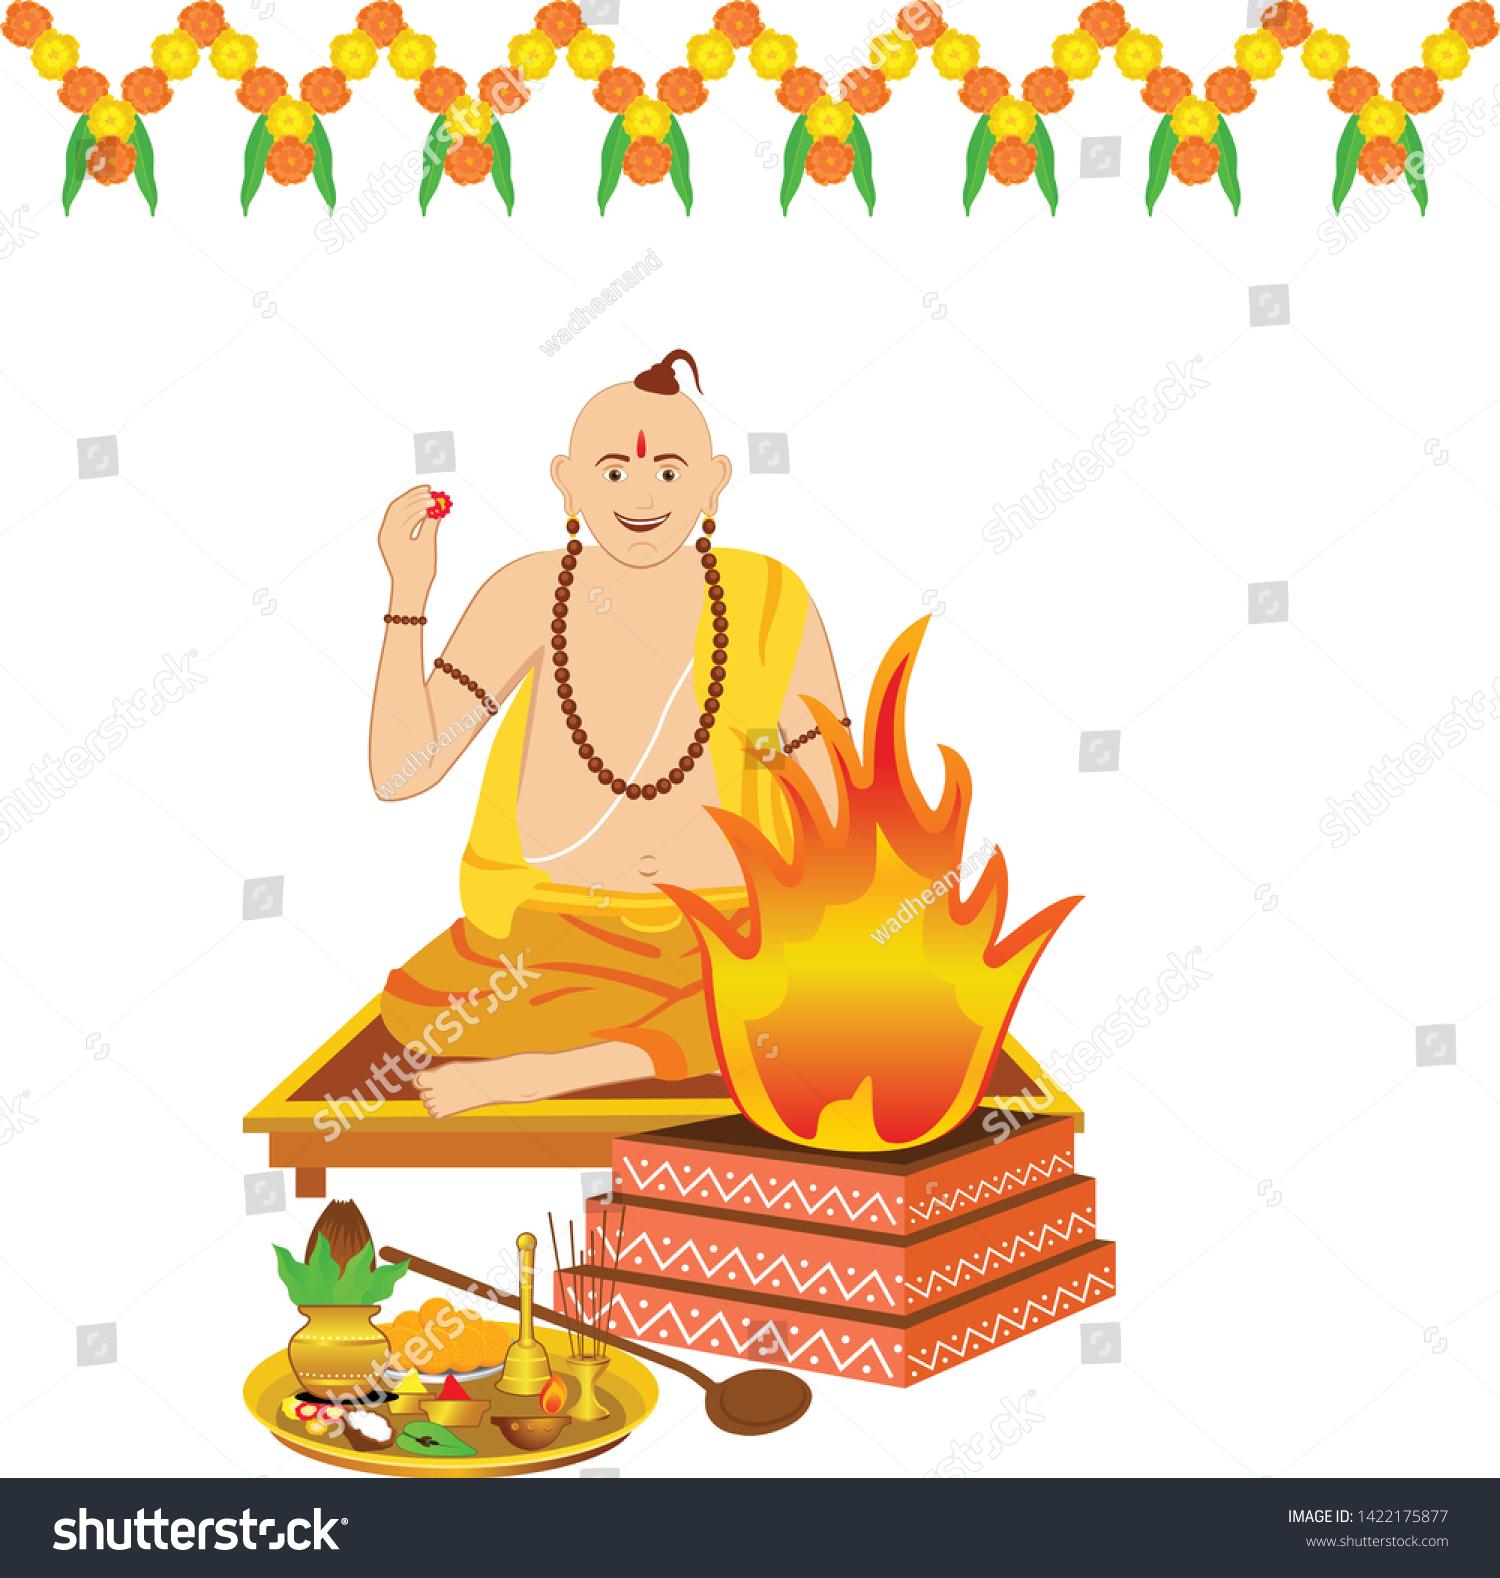 Creative design of a panditji doing the Havan or yagna pooja.